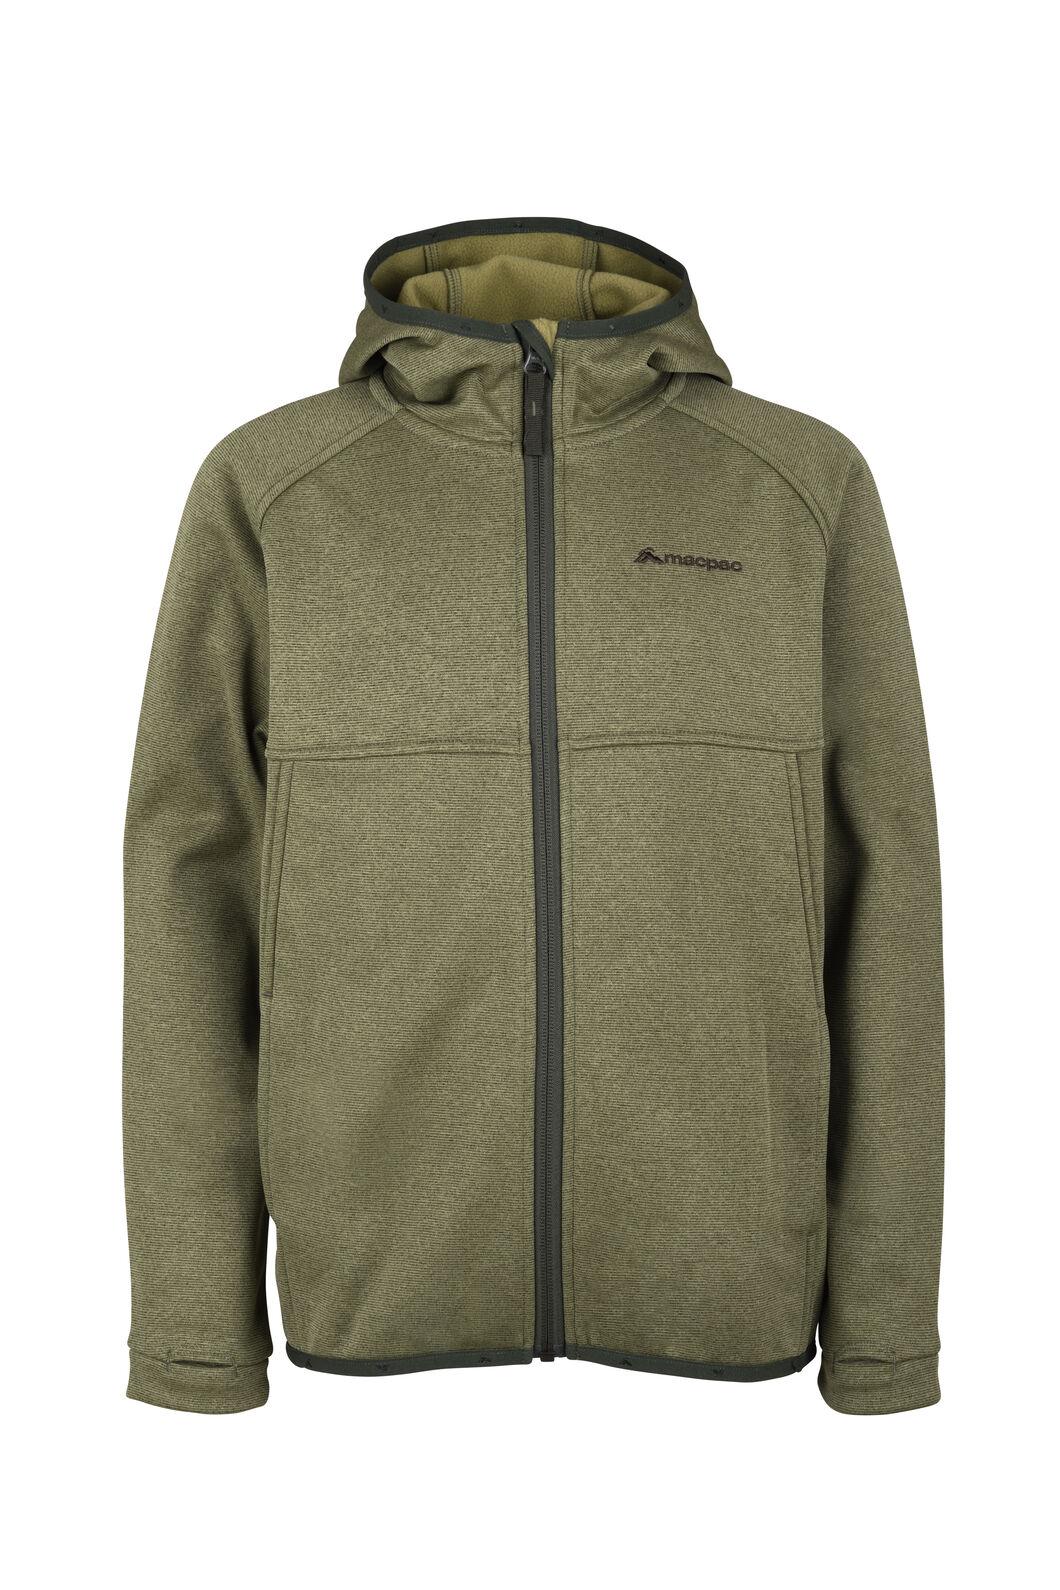 Macpac Kiwi Fleece Jacket - Kids', Loden Green, hi-res